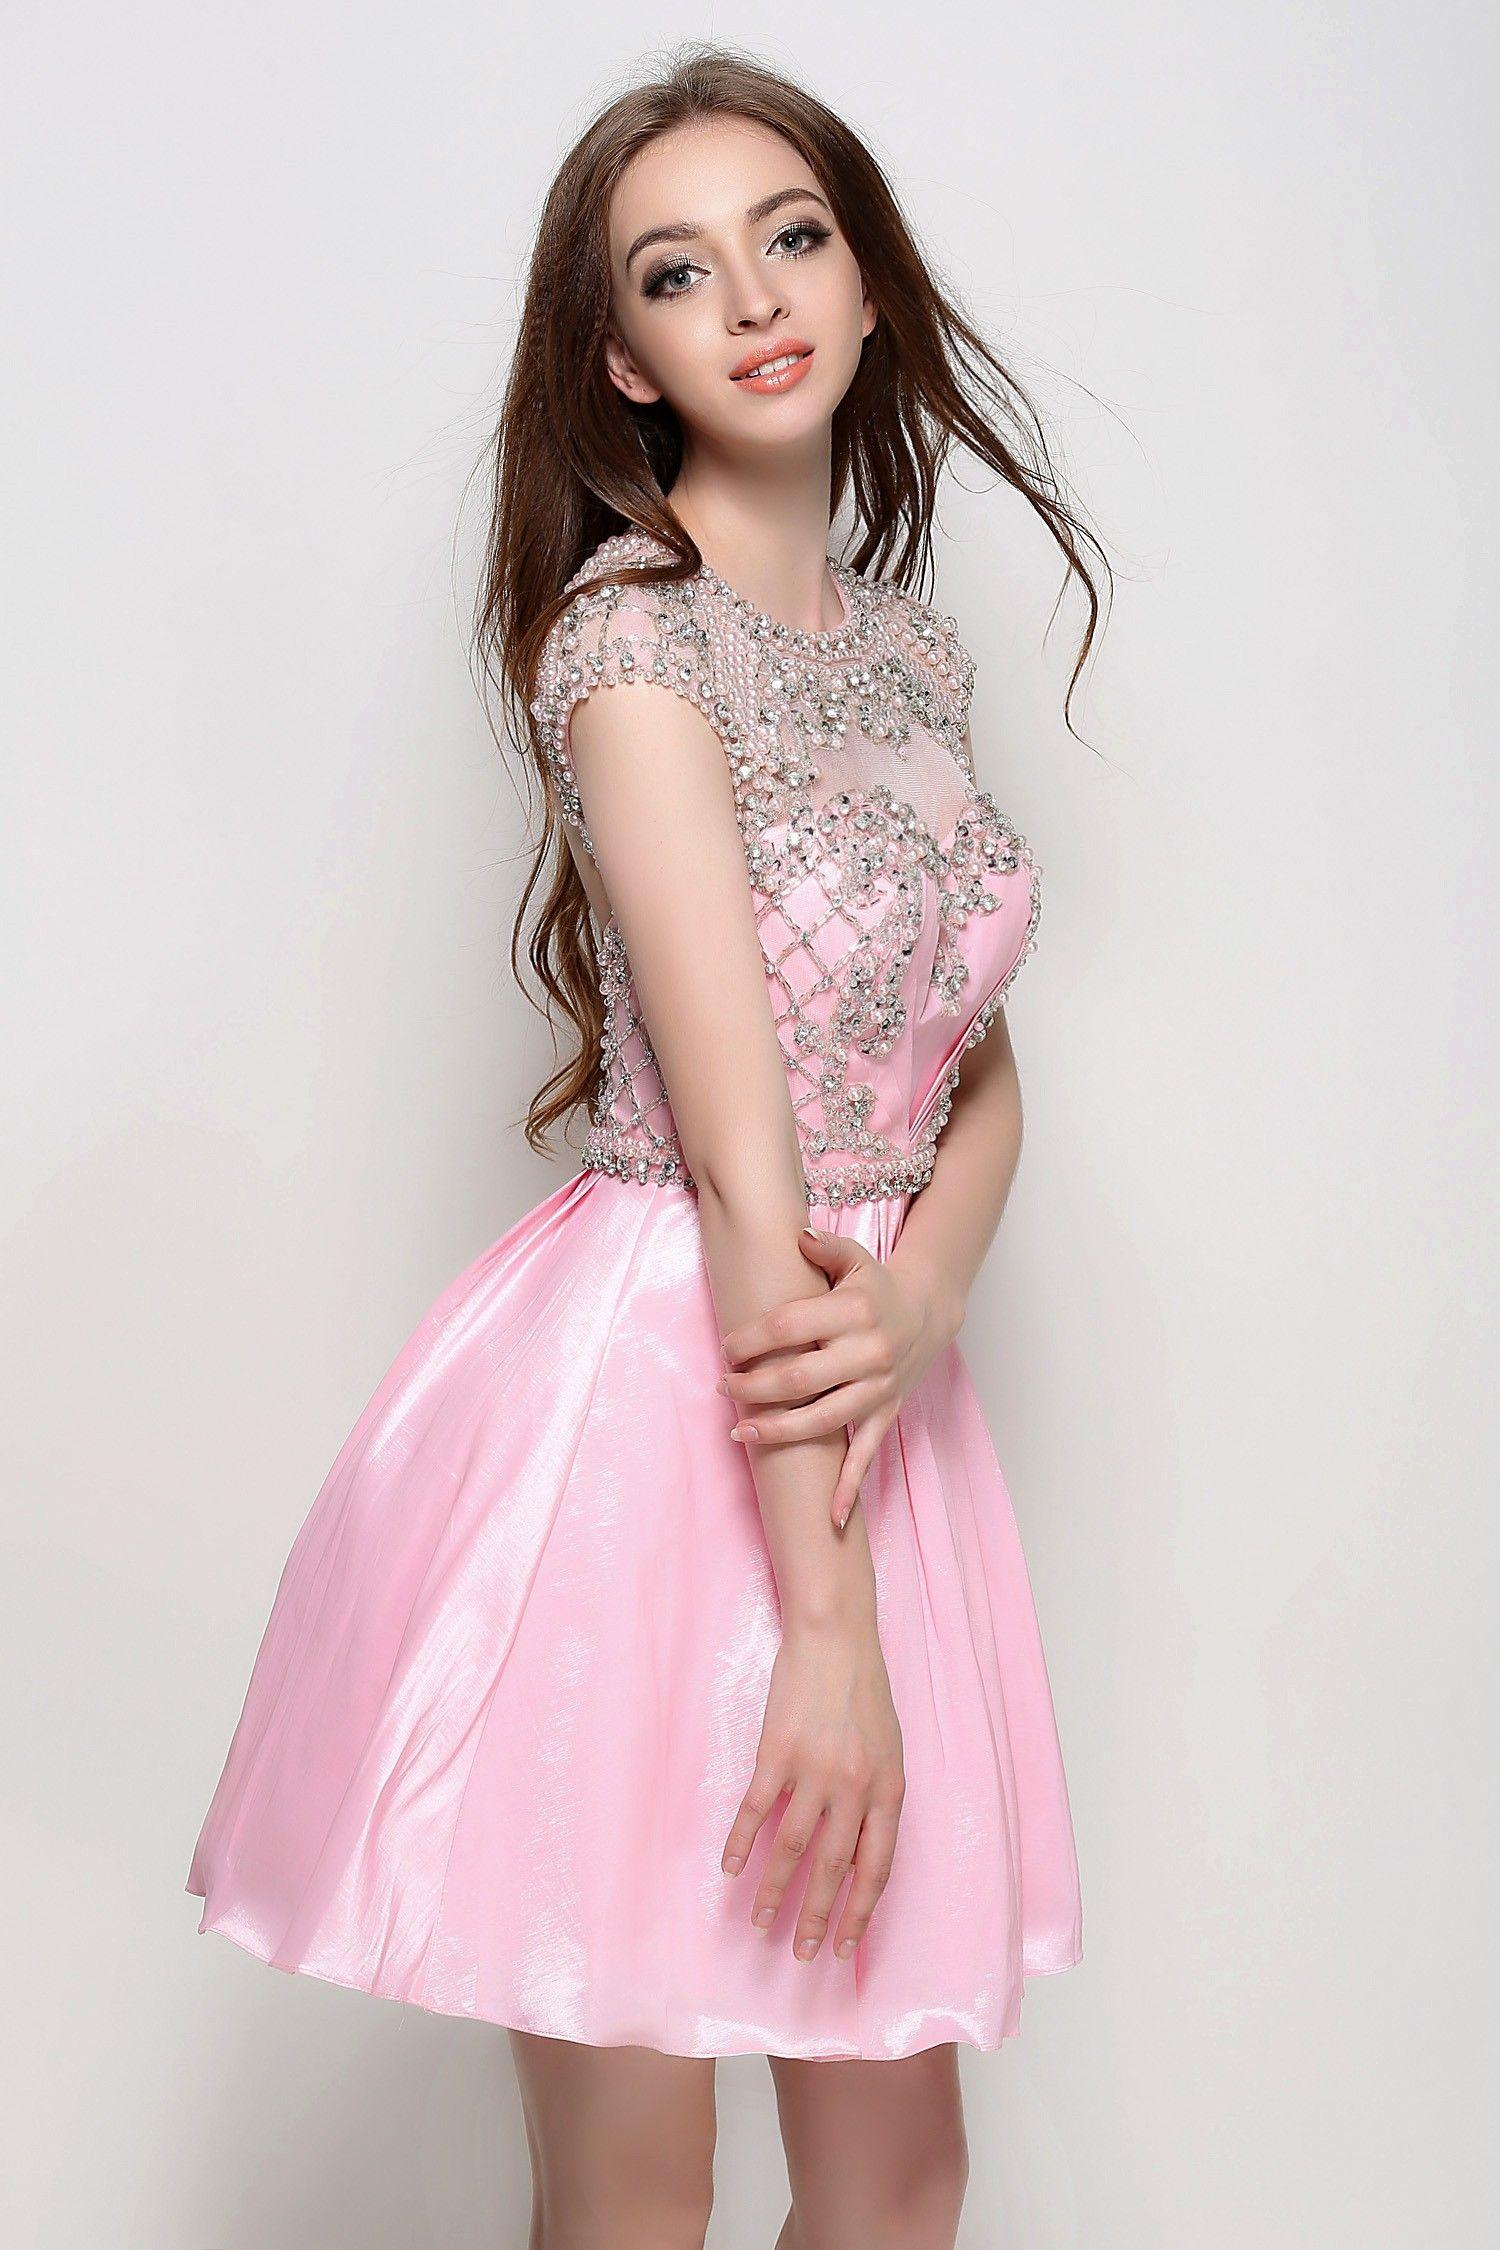 Luxury Turtleneck Prom Dress Illustration - Wedding Plan Ideas ...